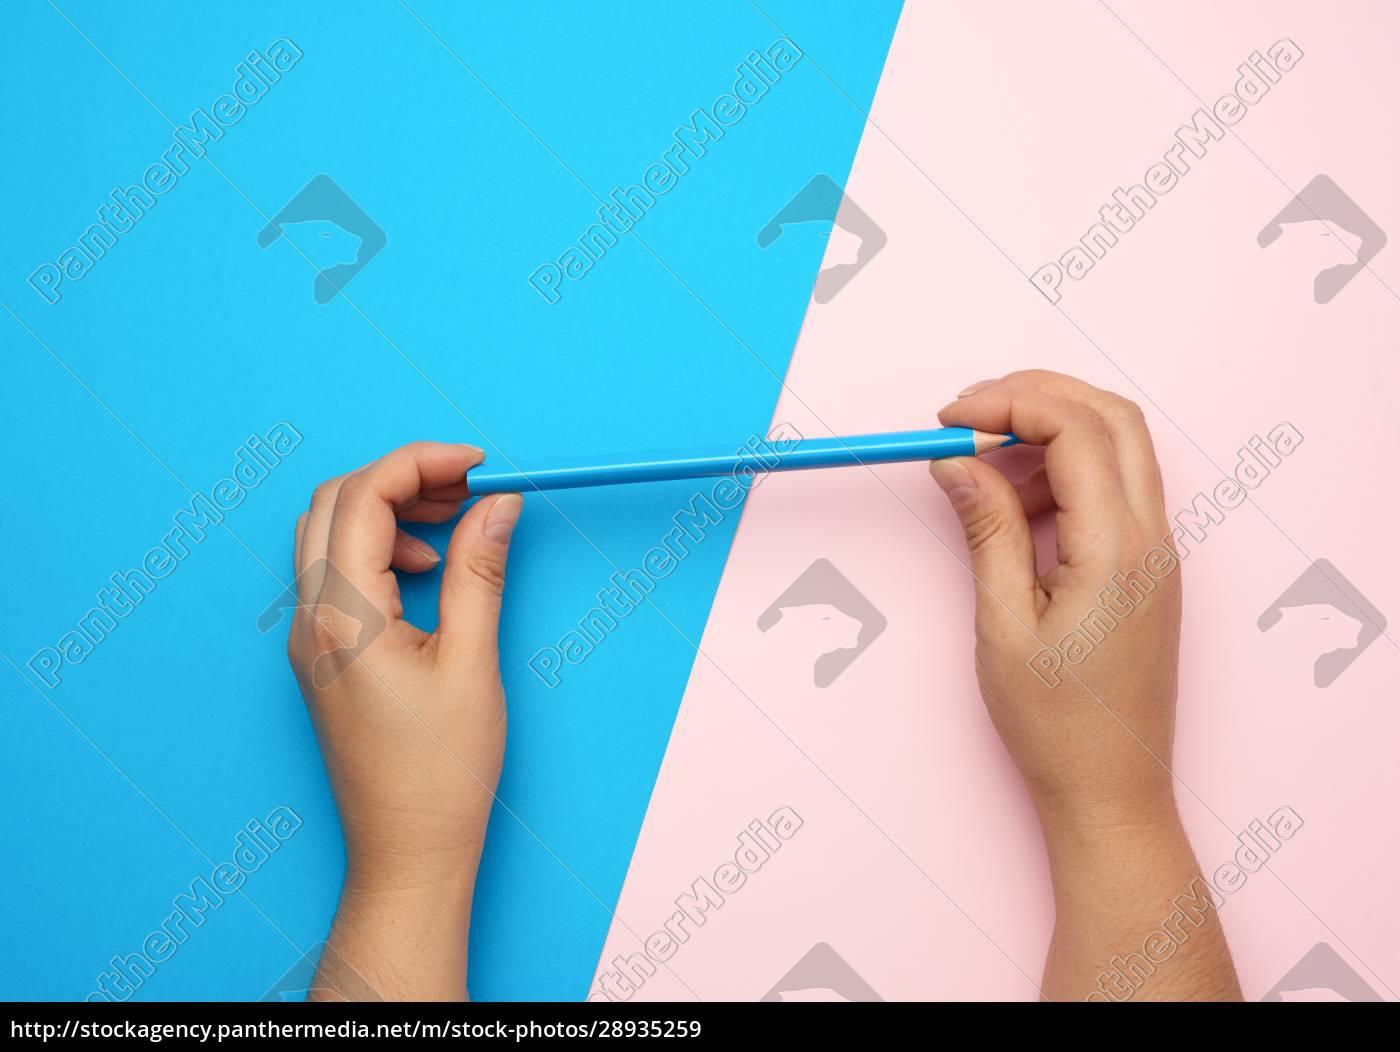 due, mani, femminili, tenere, una, matita - 28935259